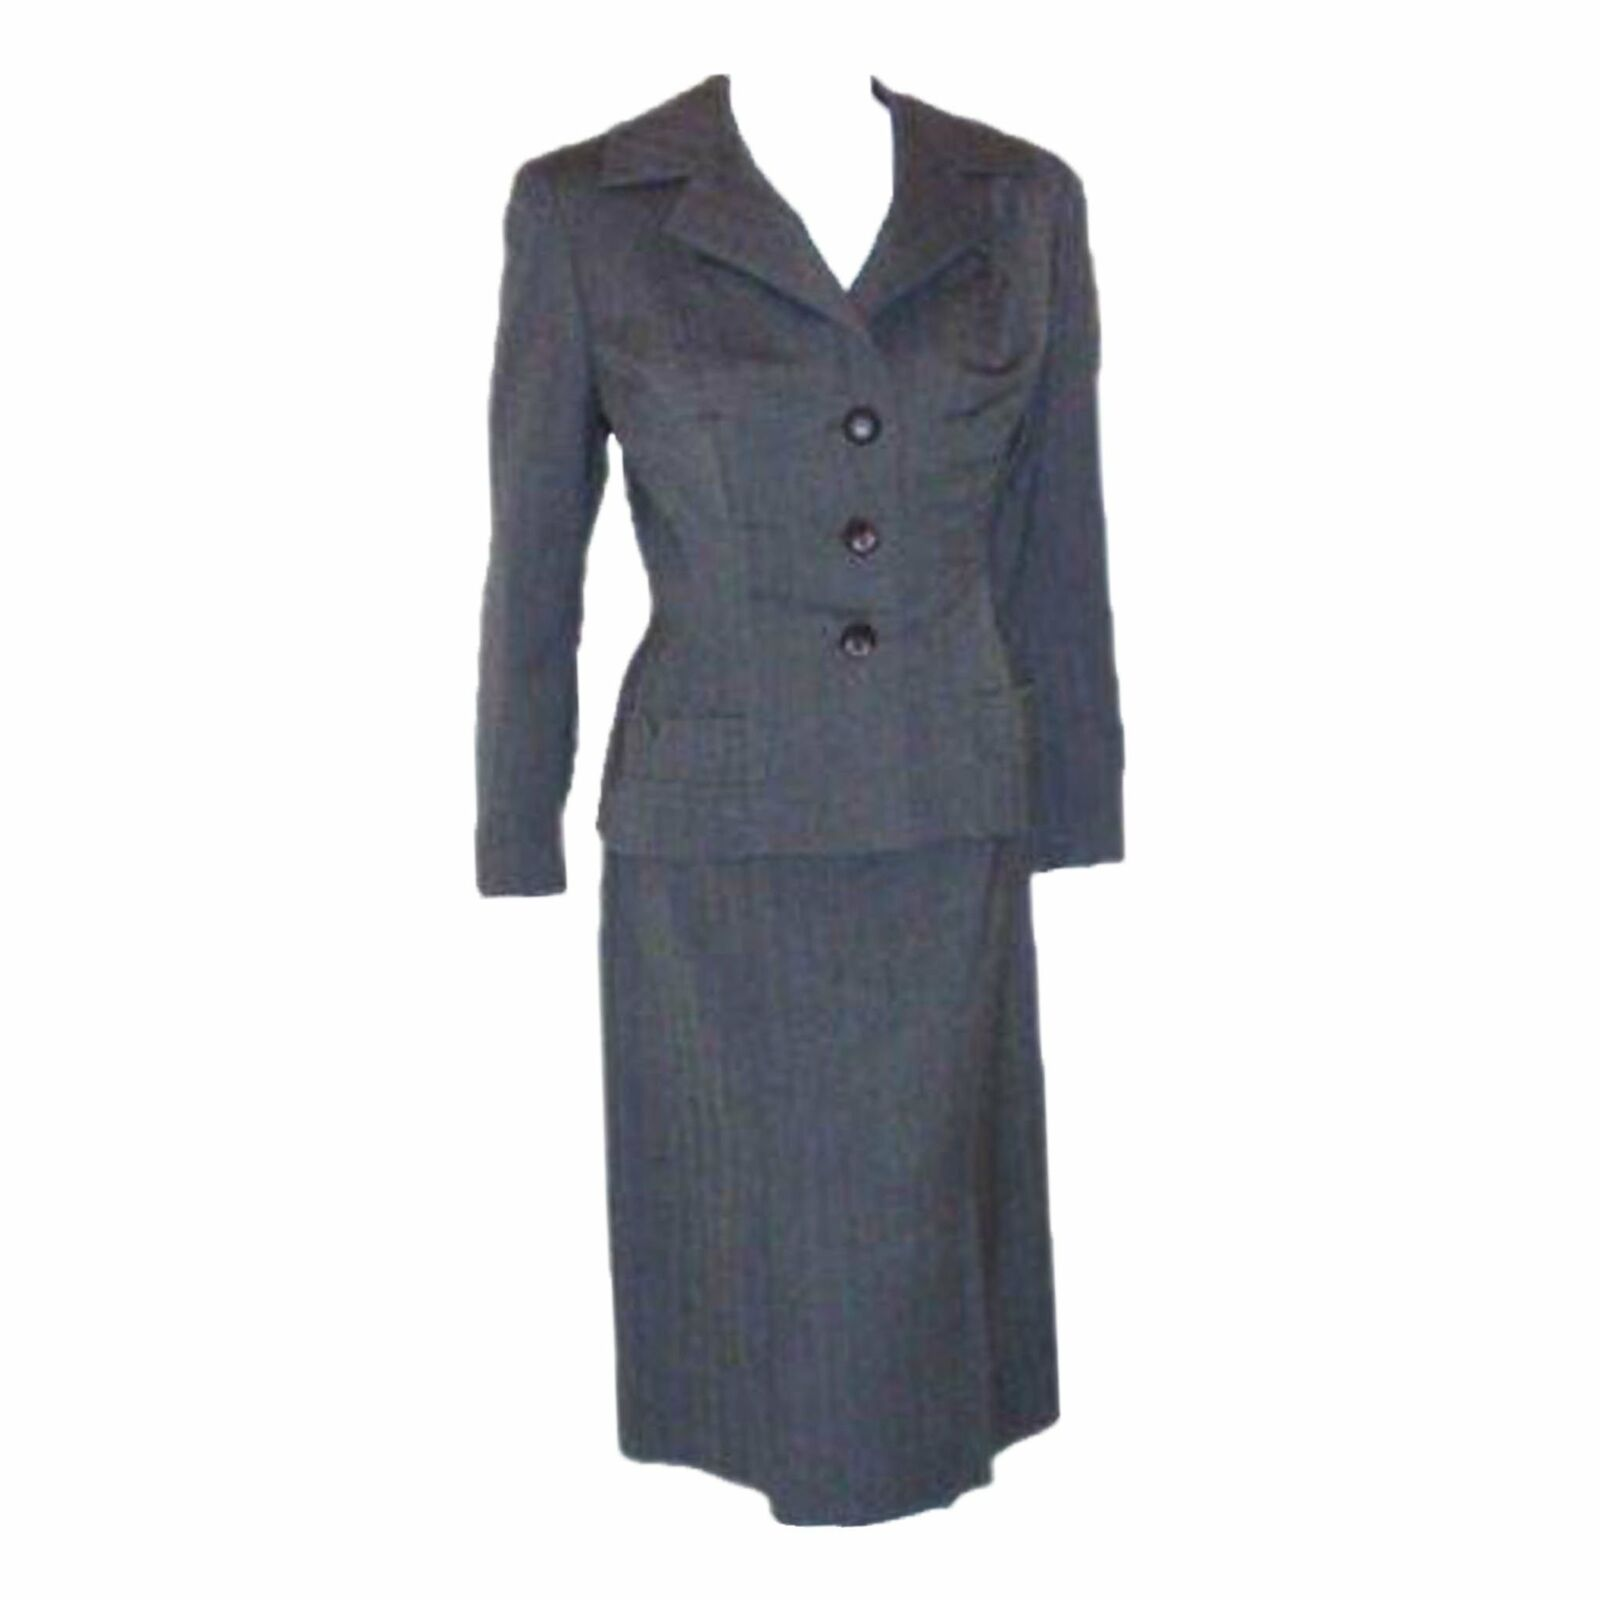 MADAME GRES 1950s 2 pc Gray Herringbone Jacket and Dress